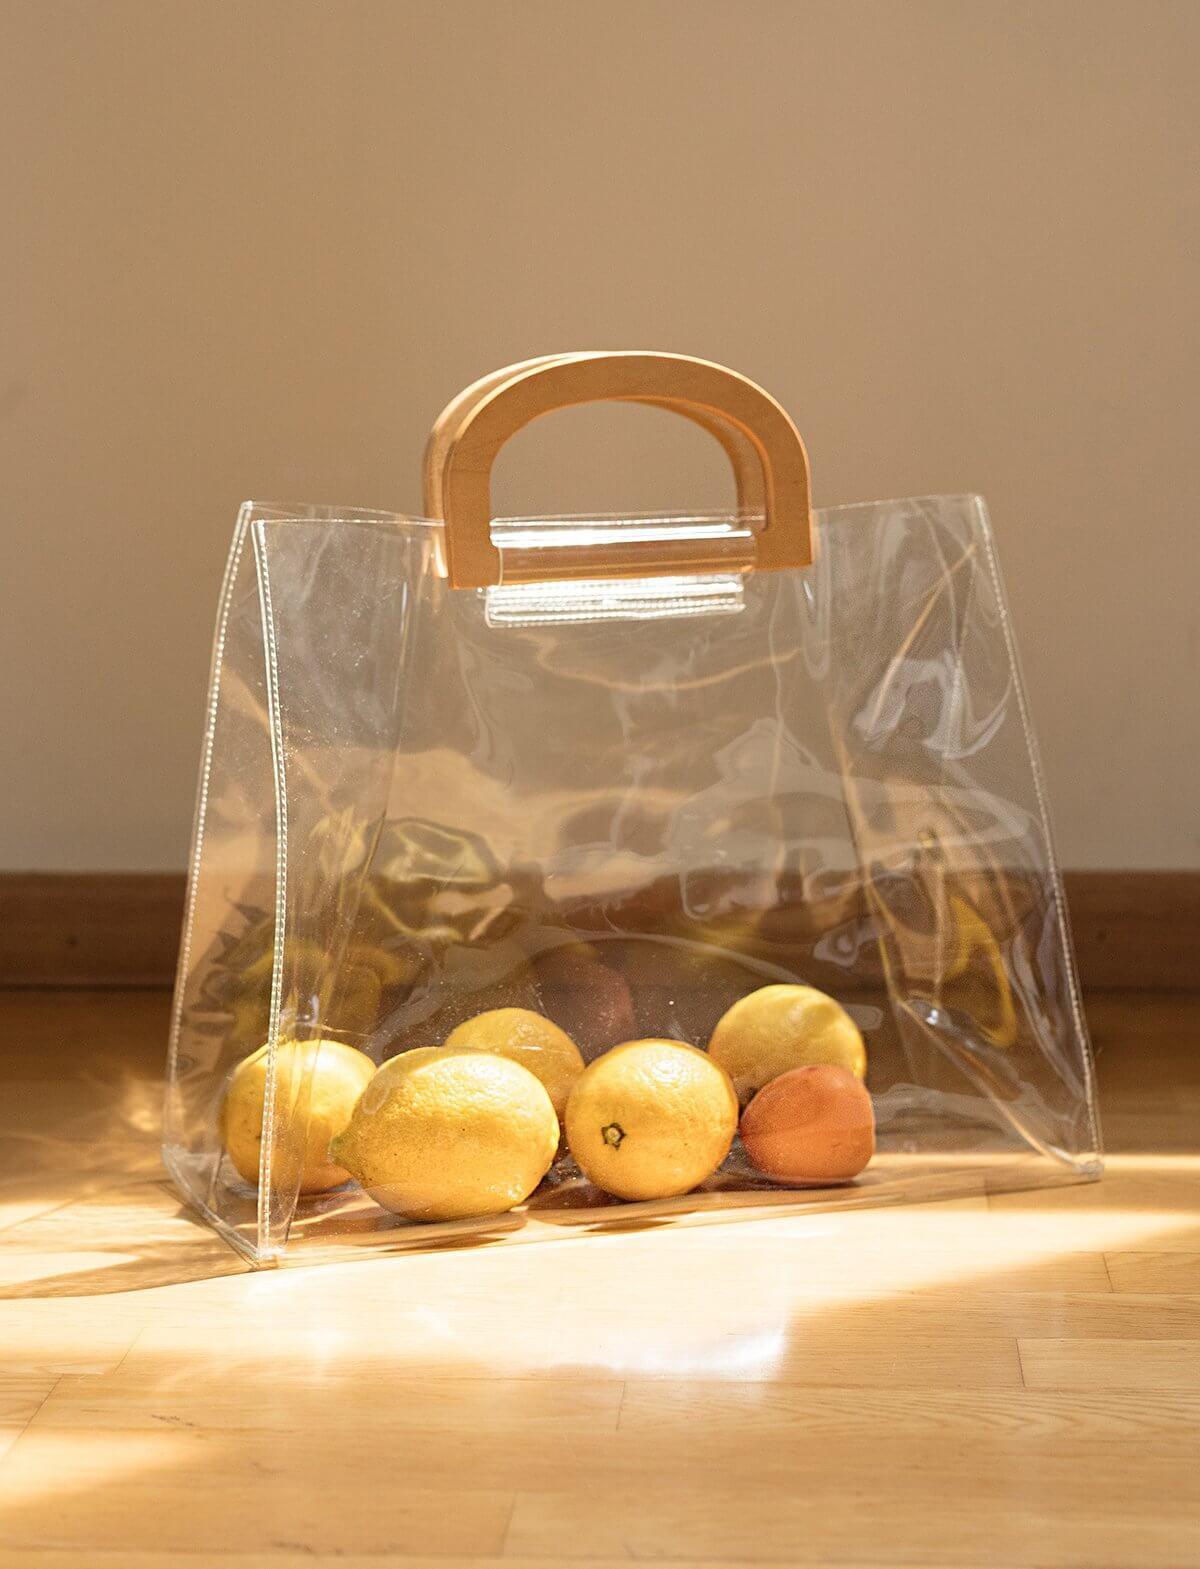 Wooden Handle Plastic Clear Tote Bag Clearplastictotes Handbags